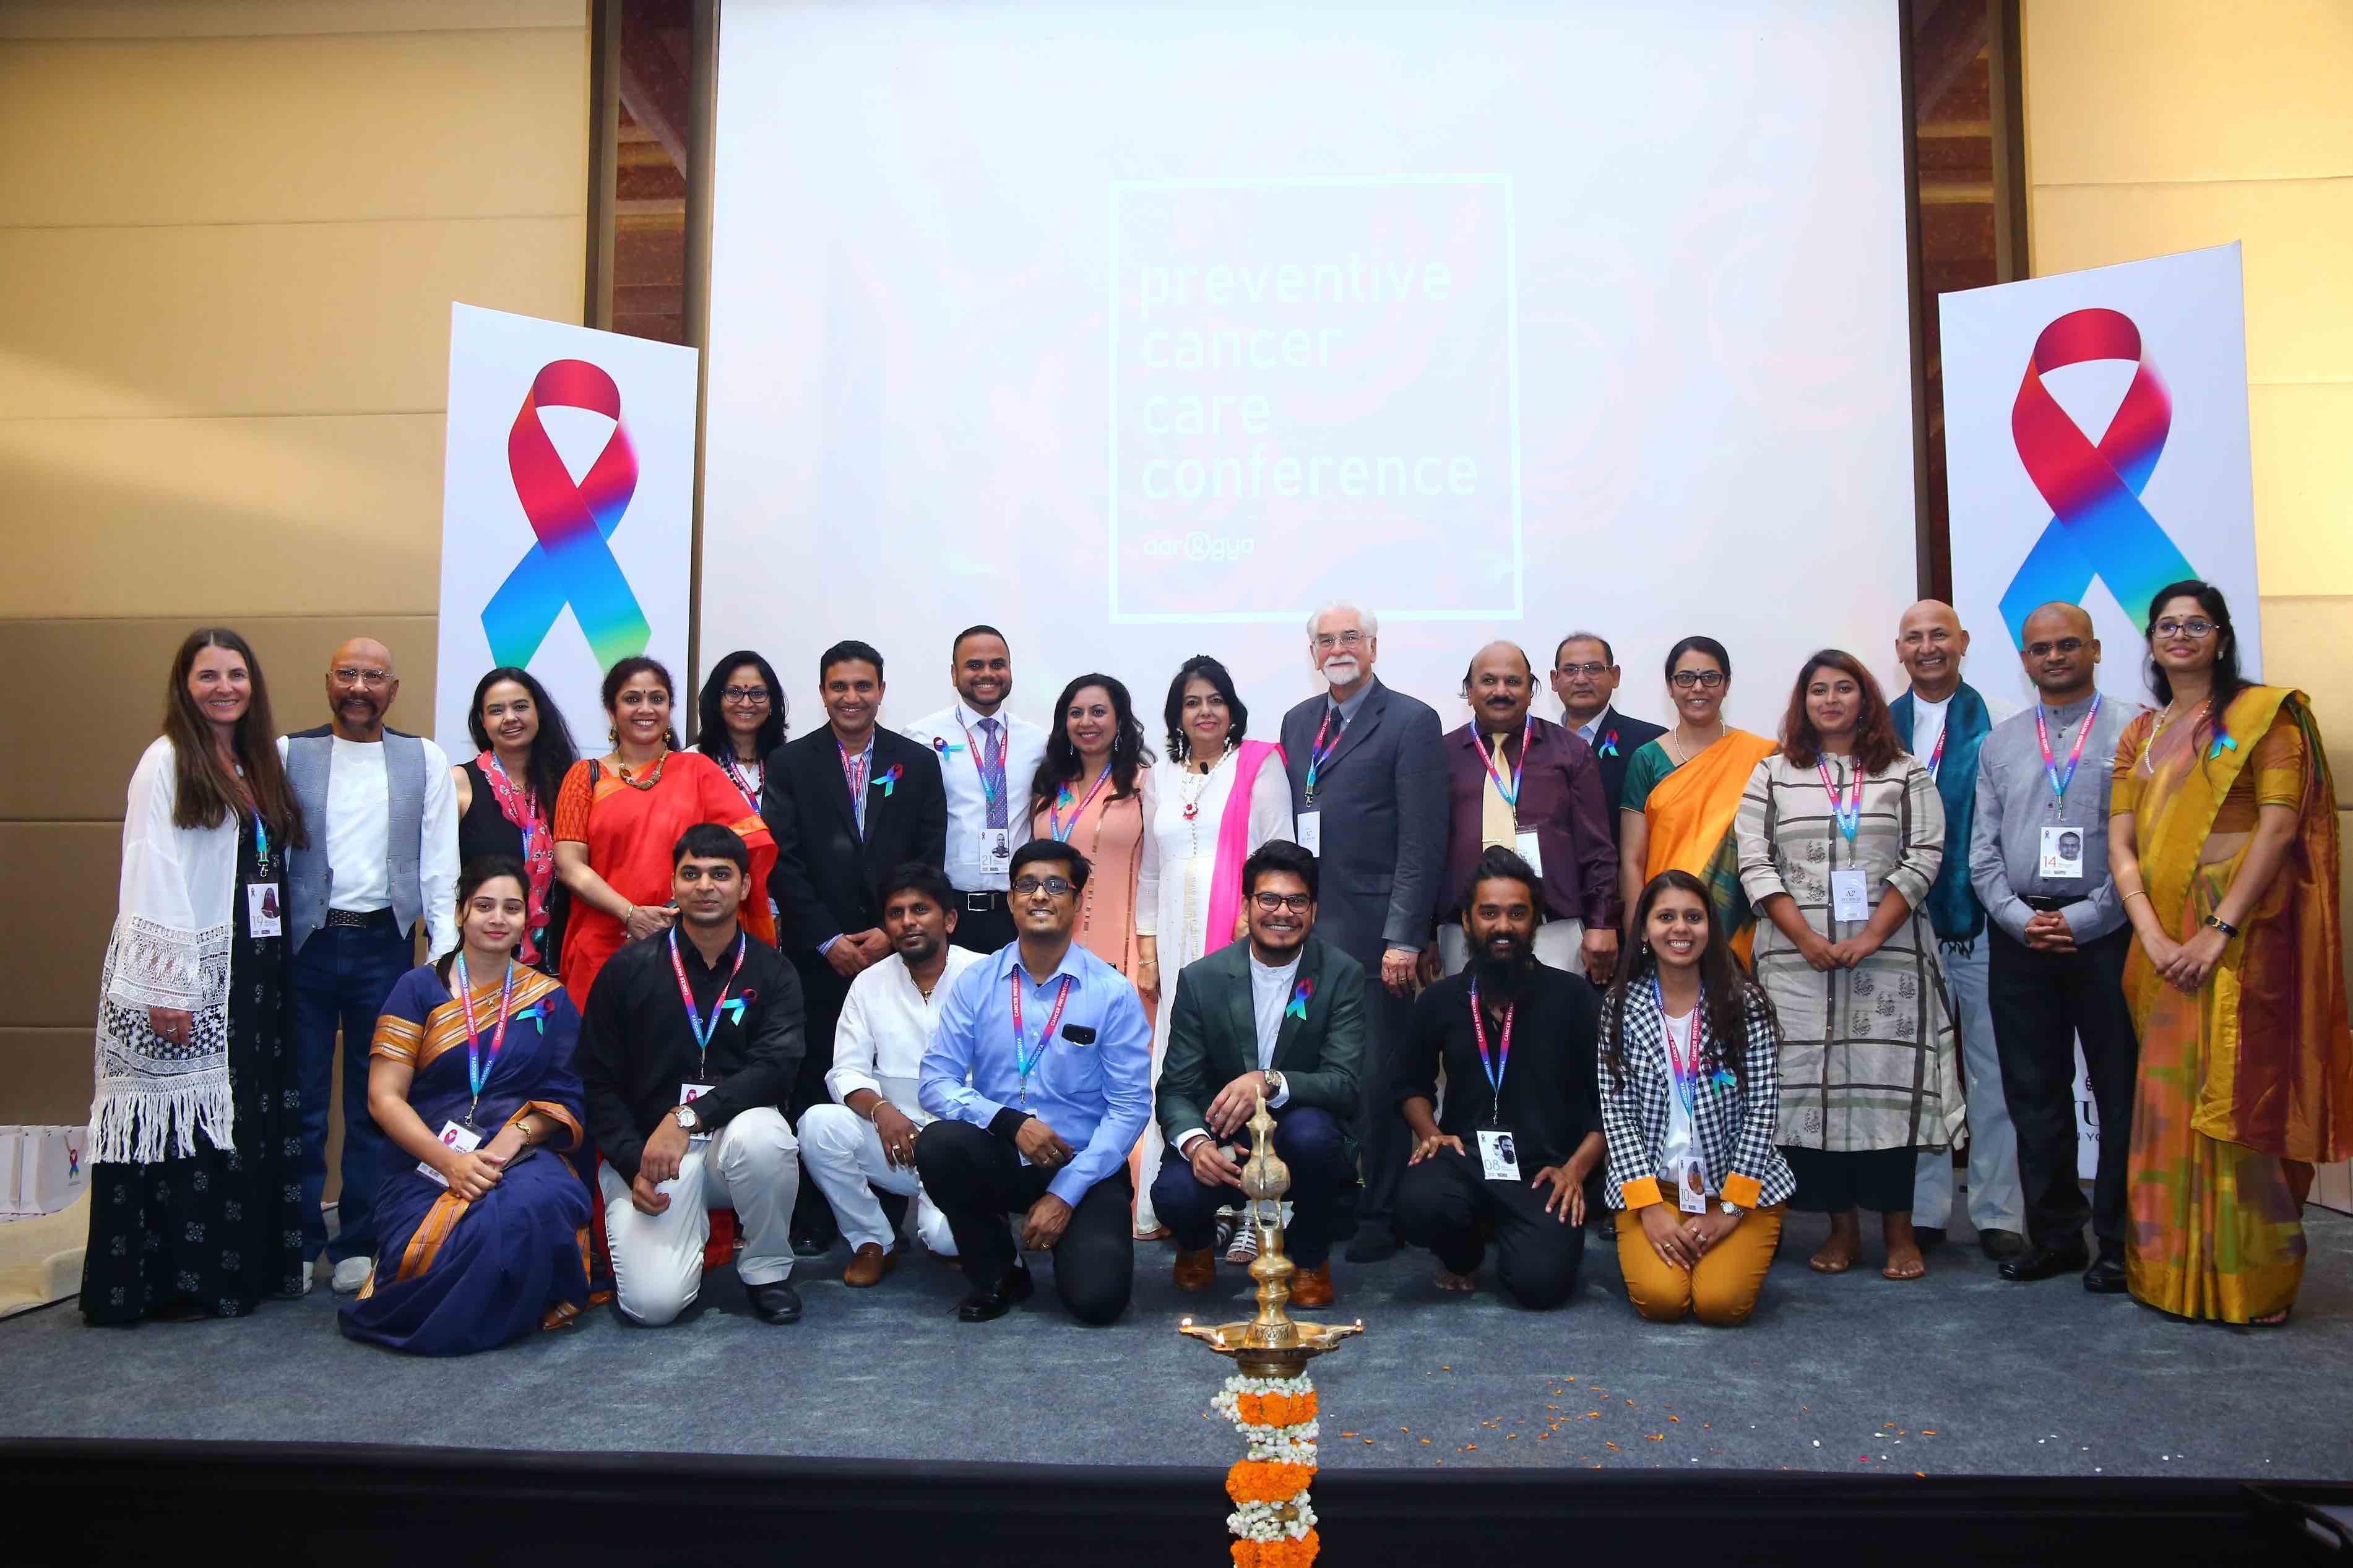 Syed Kirmani, Ananda Jayant, Pankaj Singh, Sunita Tati, Krishna Madappa, Dr. David Christopher and Sarat Addanki